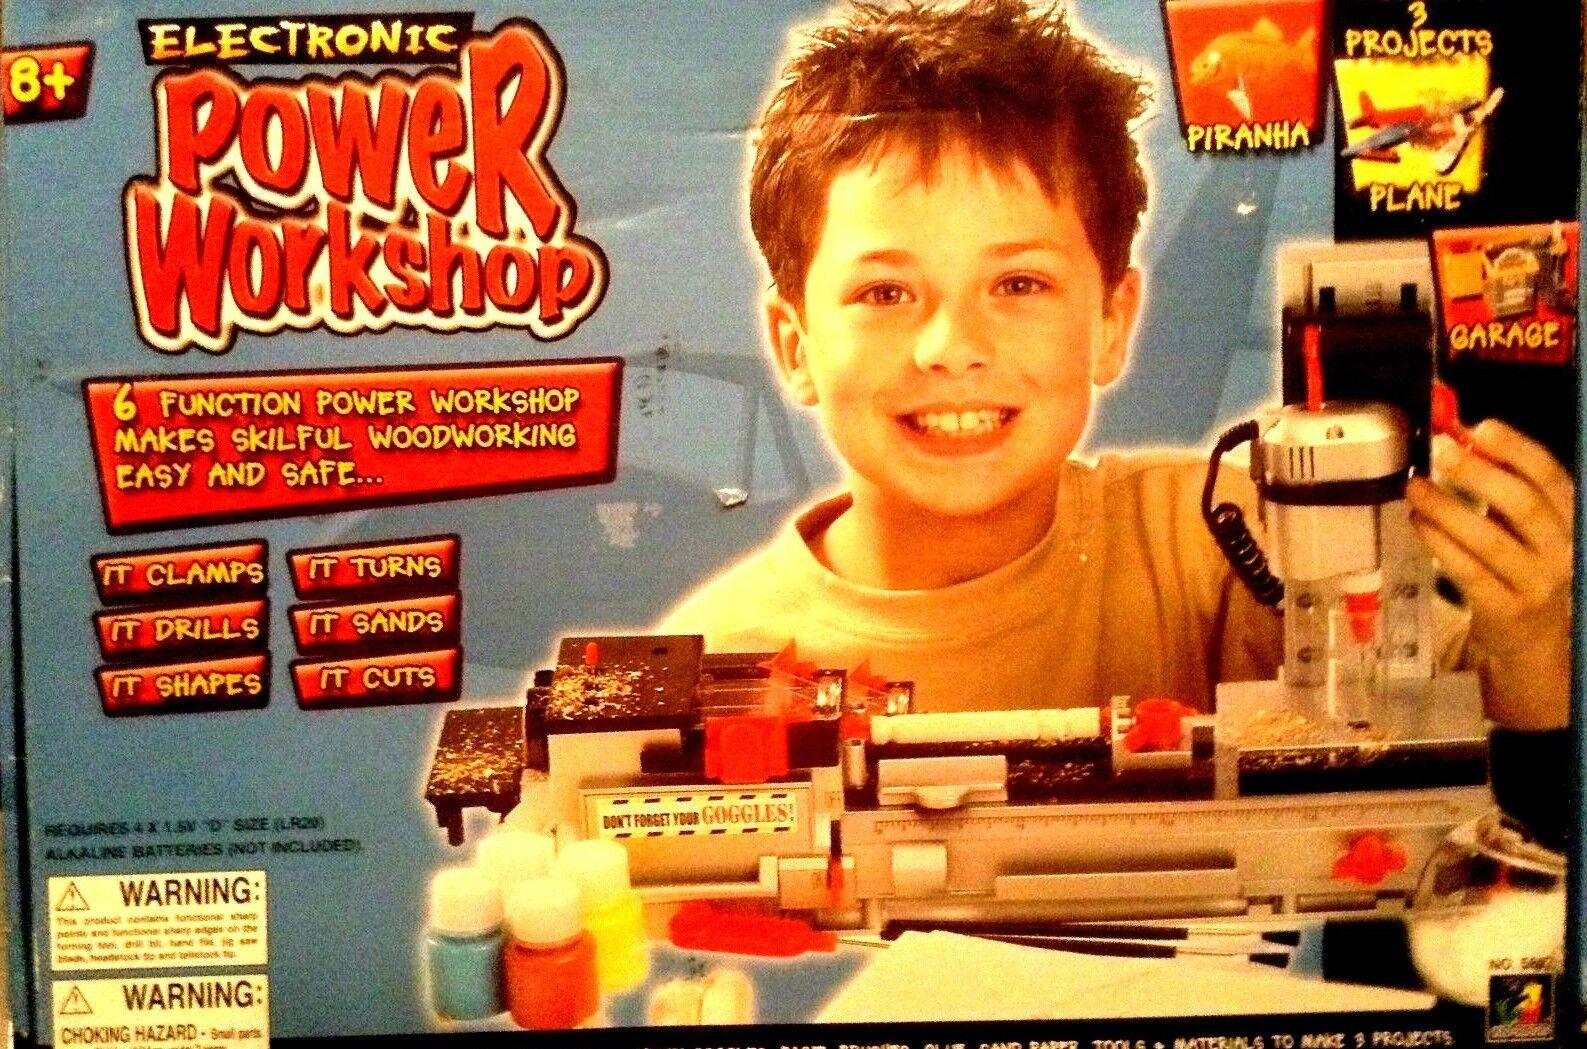 Sällsynt Electronic Power Workshop av Kid-Riffific